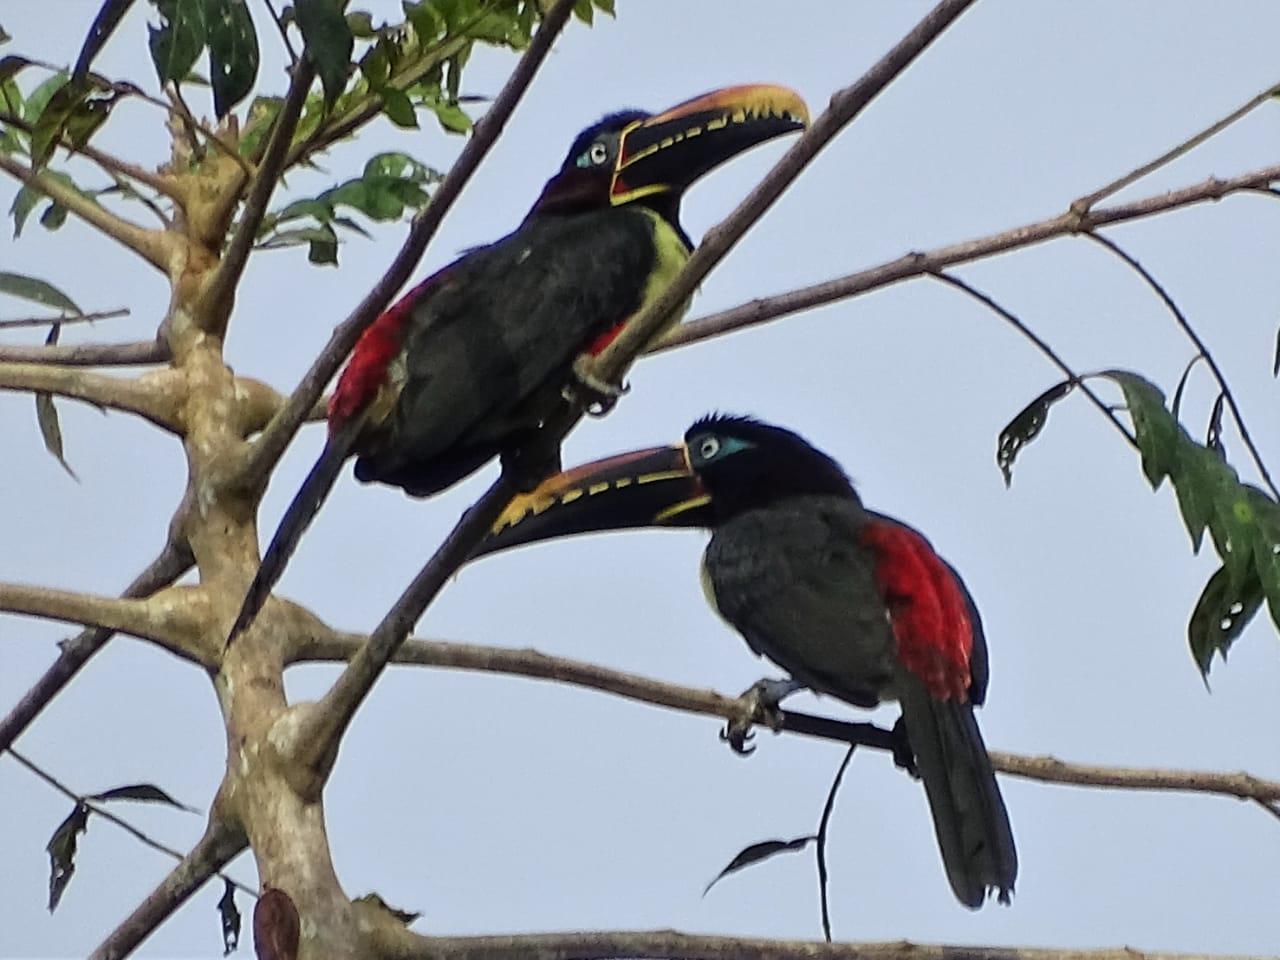 Avistamiento aves Amazonas (14)